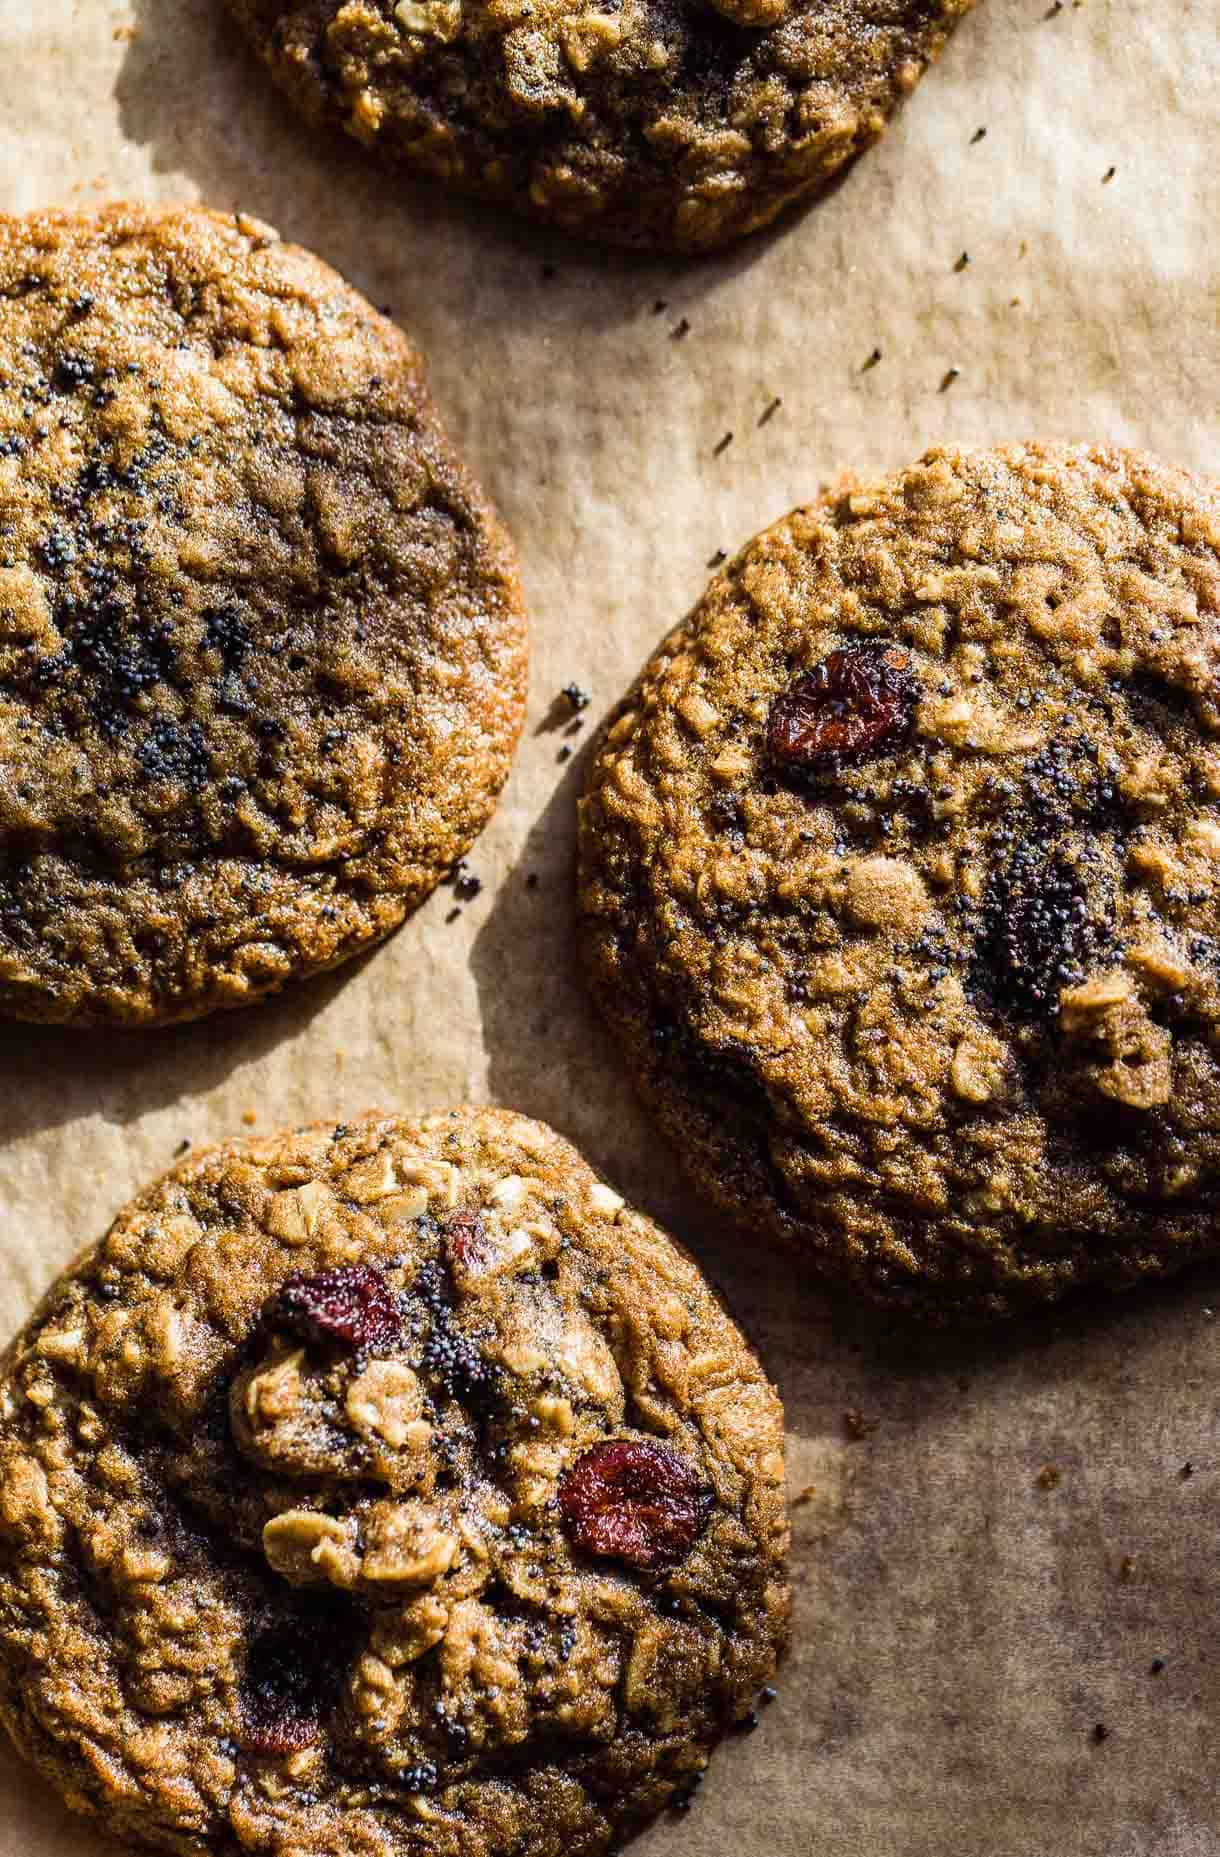 Cranberry Poppy Seed Gluten Free Oatmeal Cookies on baking sheet (recipe)